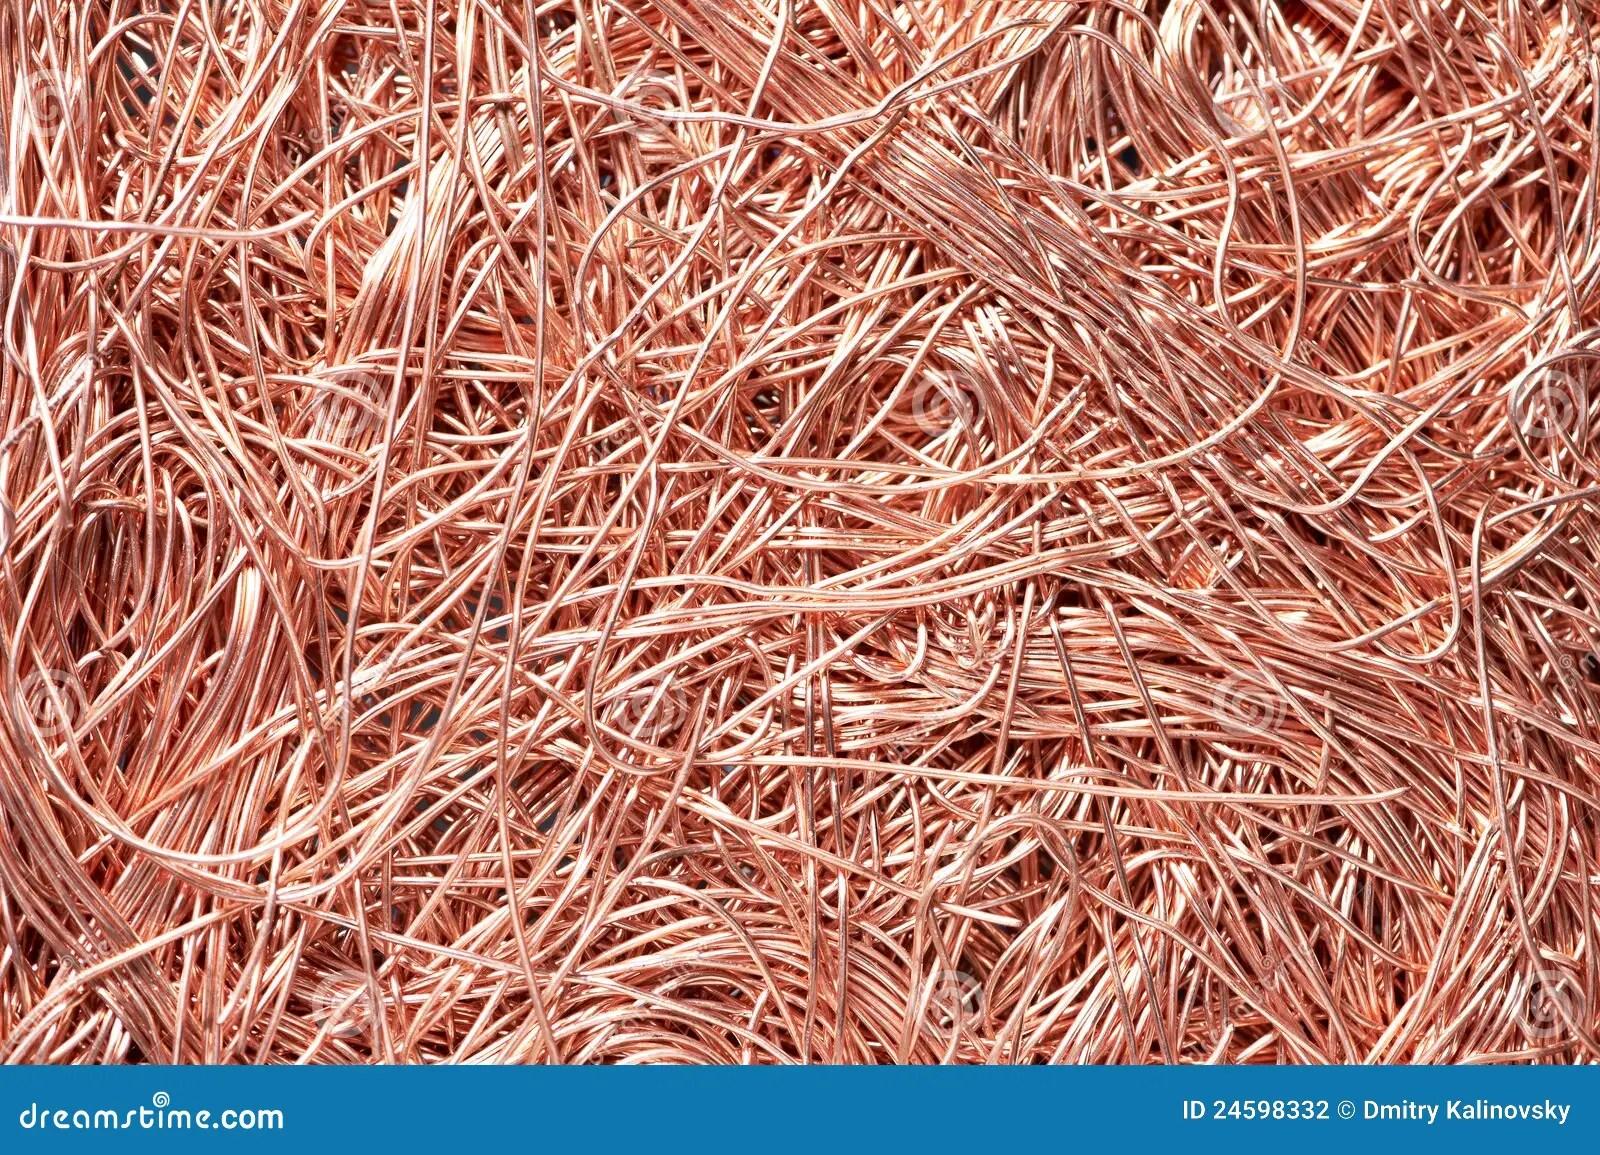 Copper Metal Scrap Materials Recycling Backround Stock